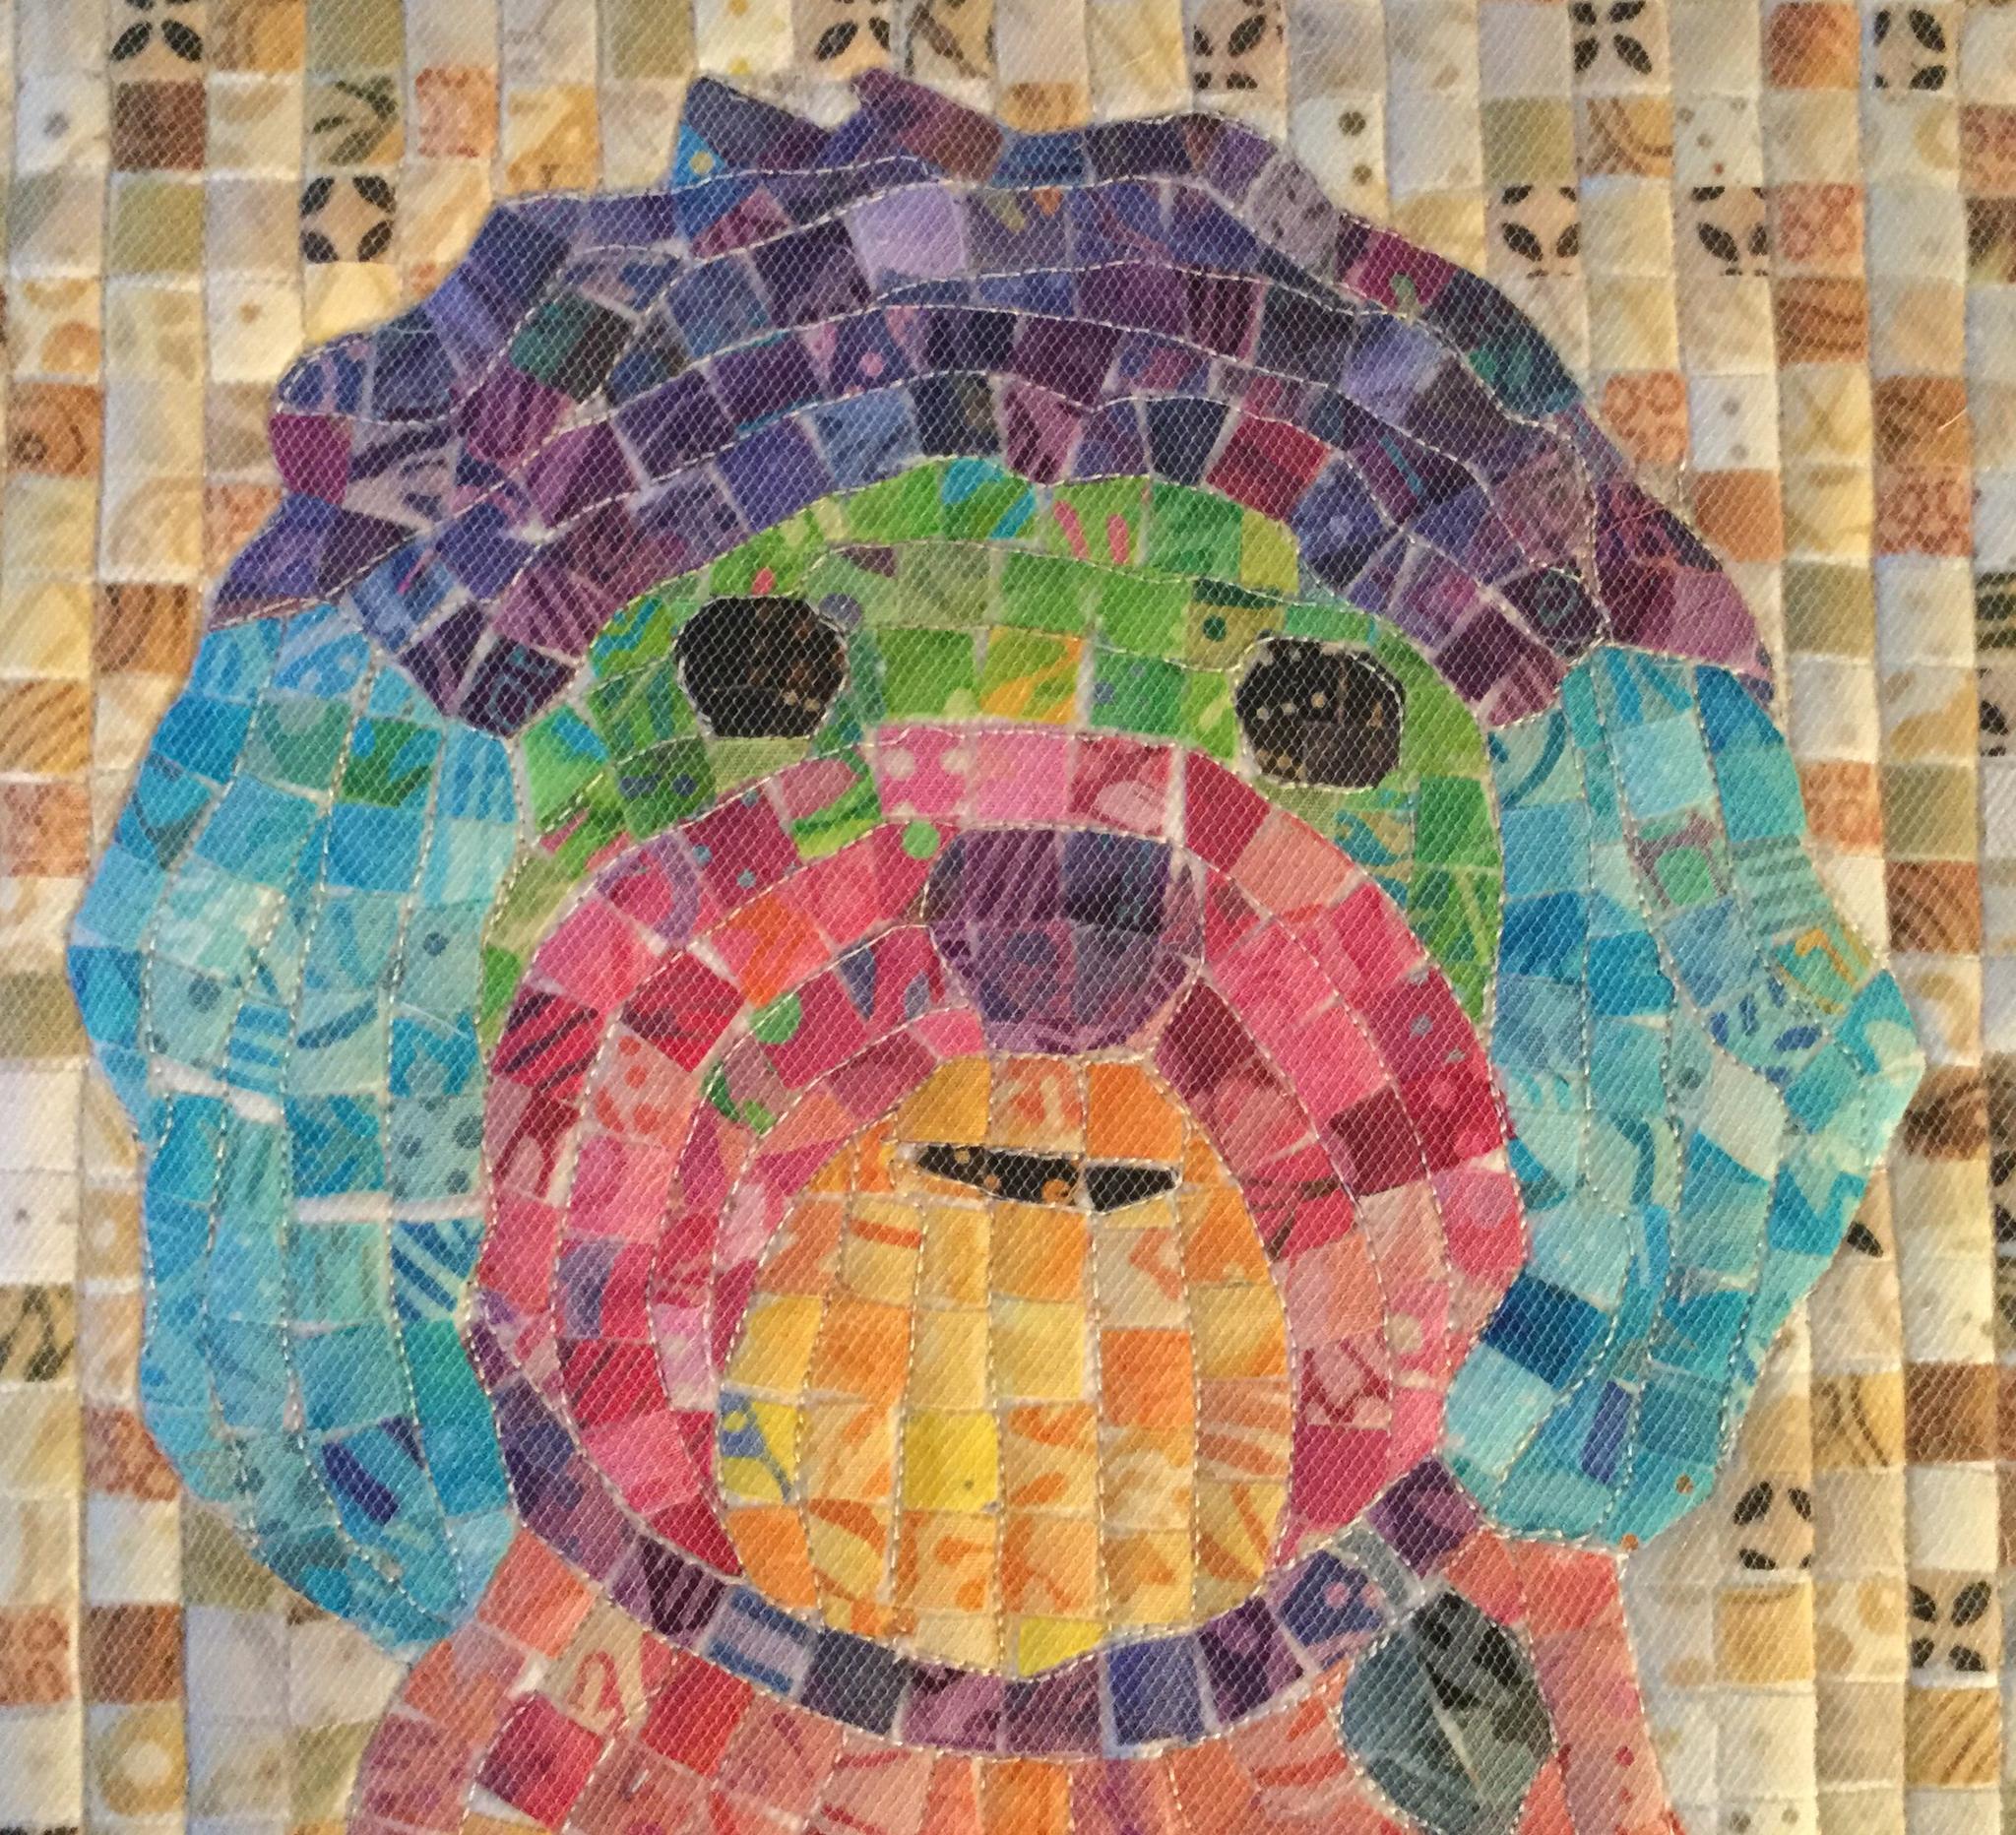 cheryl lynch quilts mini mosaics magic. Black Bedroom Furniture Sets. Home Design Ideas